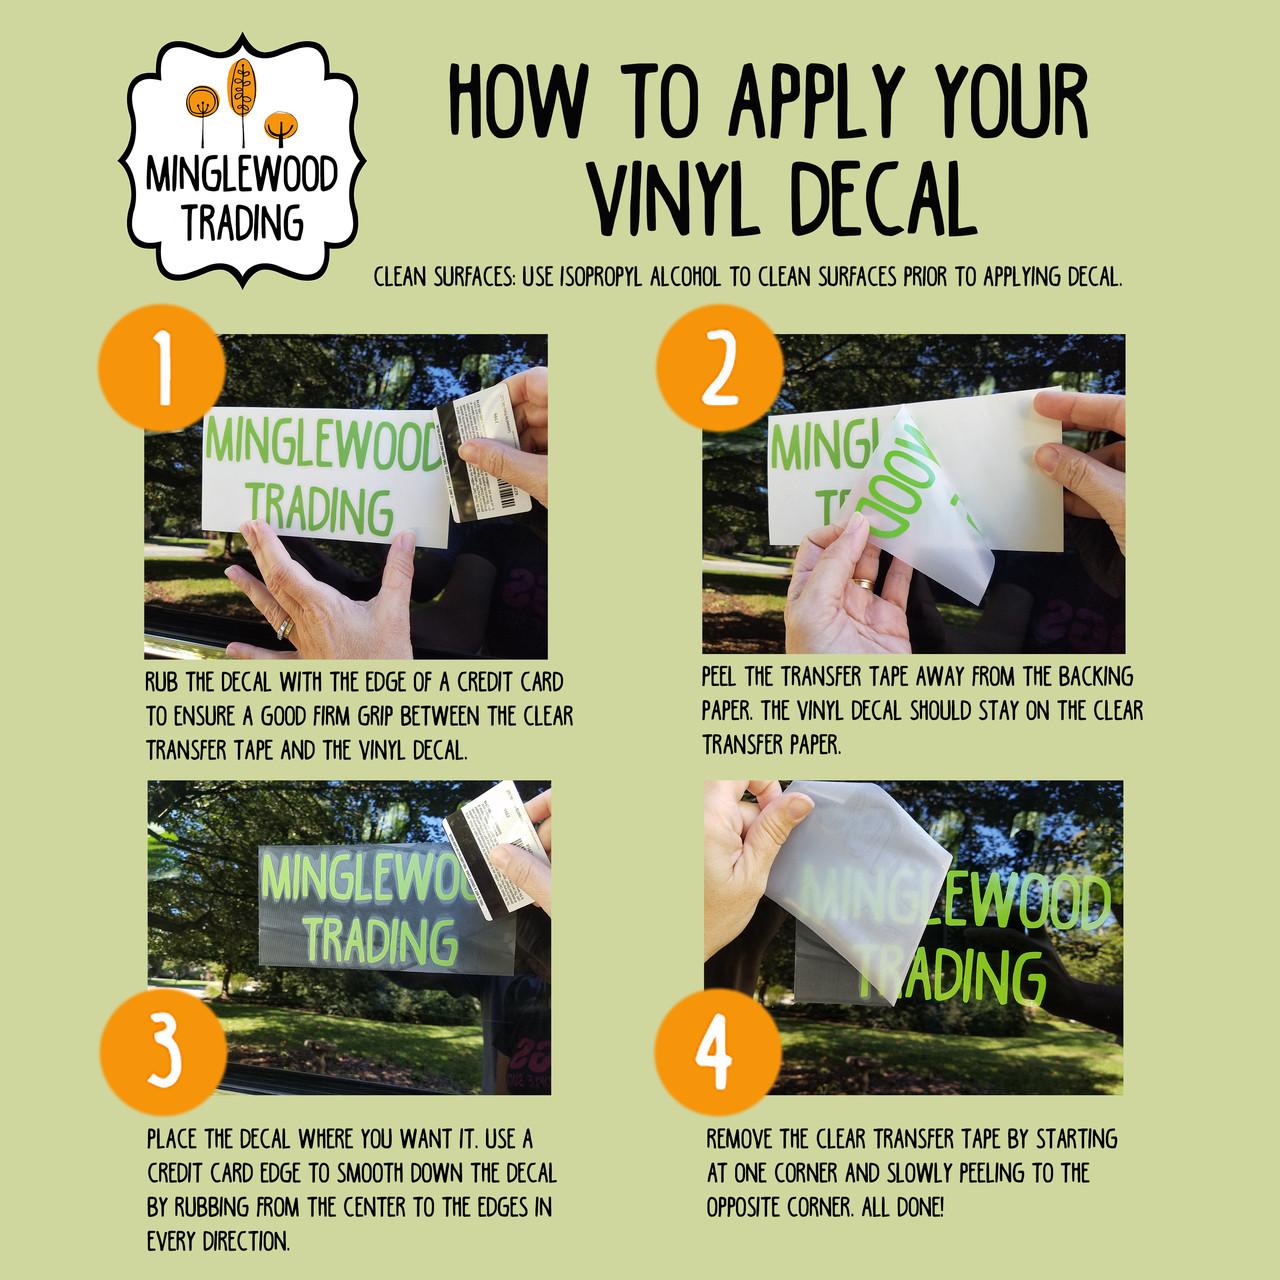 Bigfoot Cornhole Board Decals V1 - PNW Sasquatch  - Vinyl Die Cut Stickers - each 20w x 30h inches